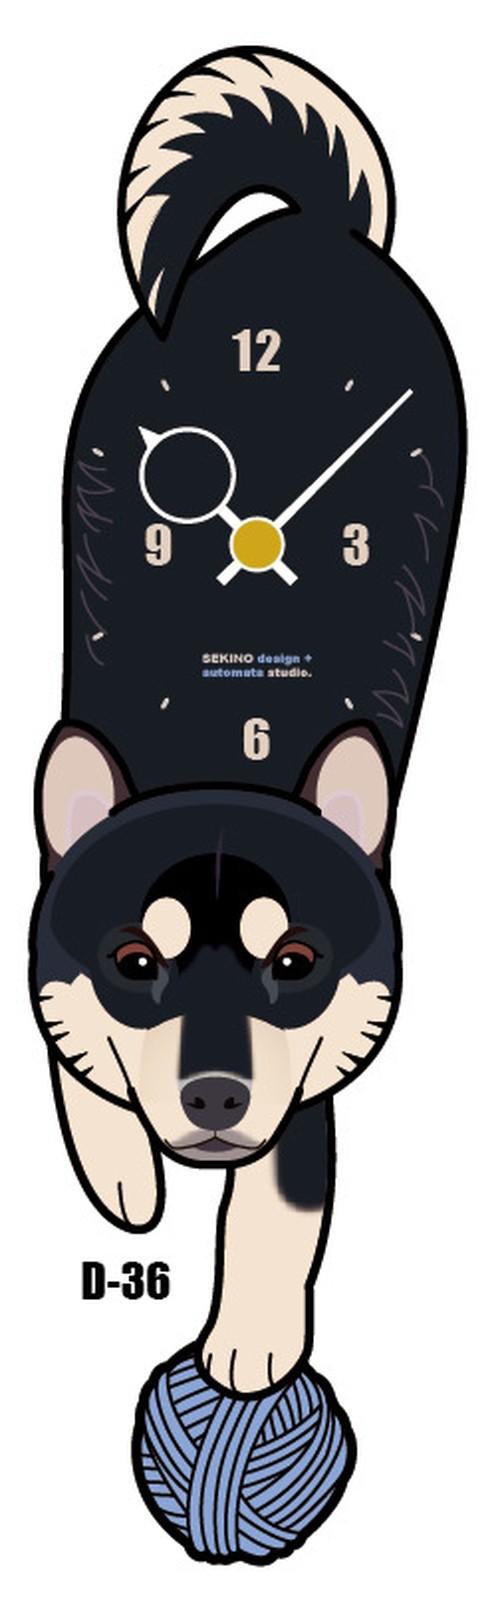 D-36 黒柴クロシバ-犬の振り子時計